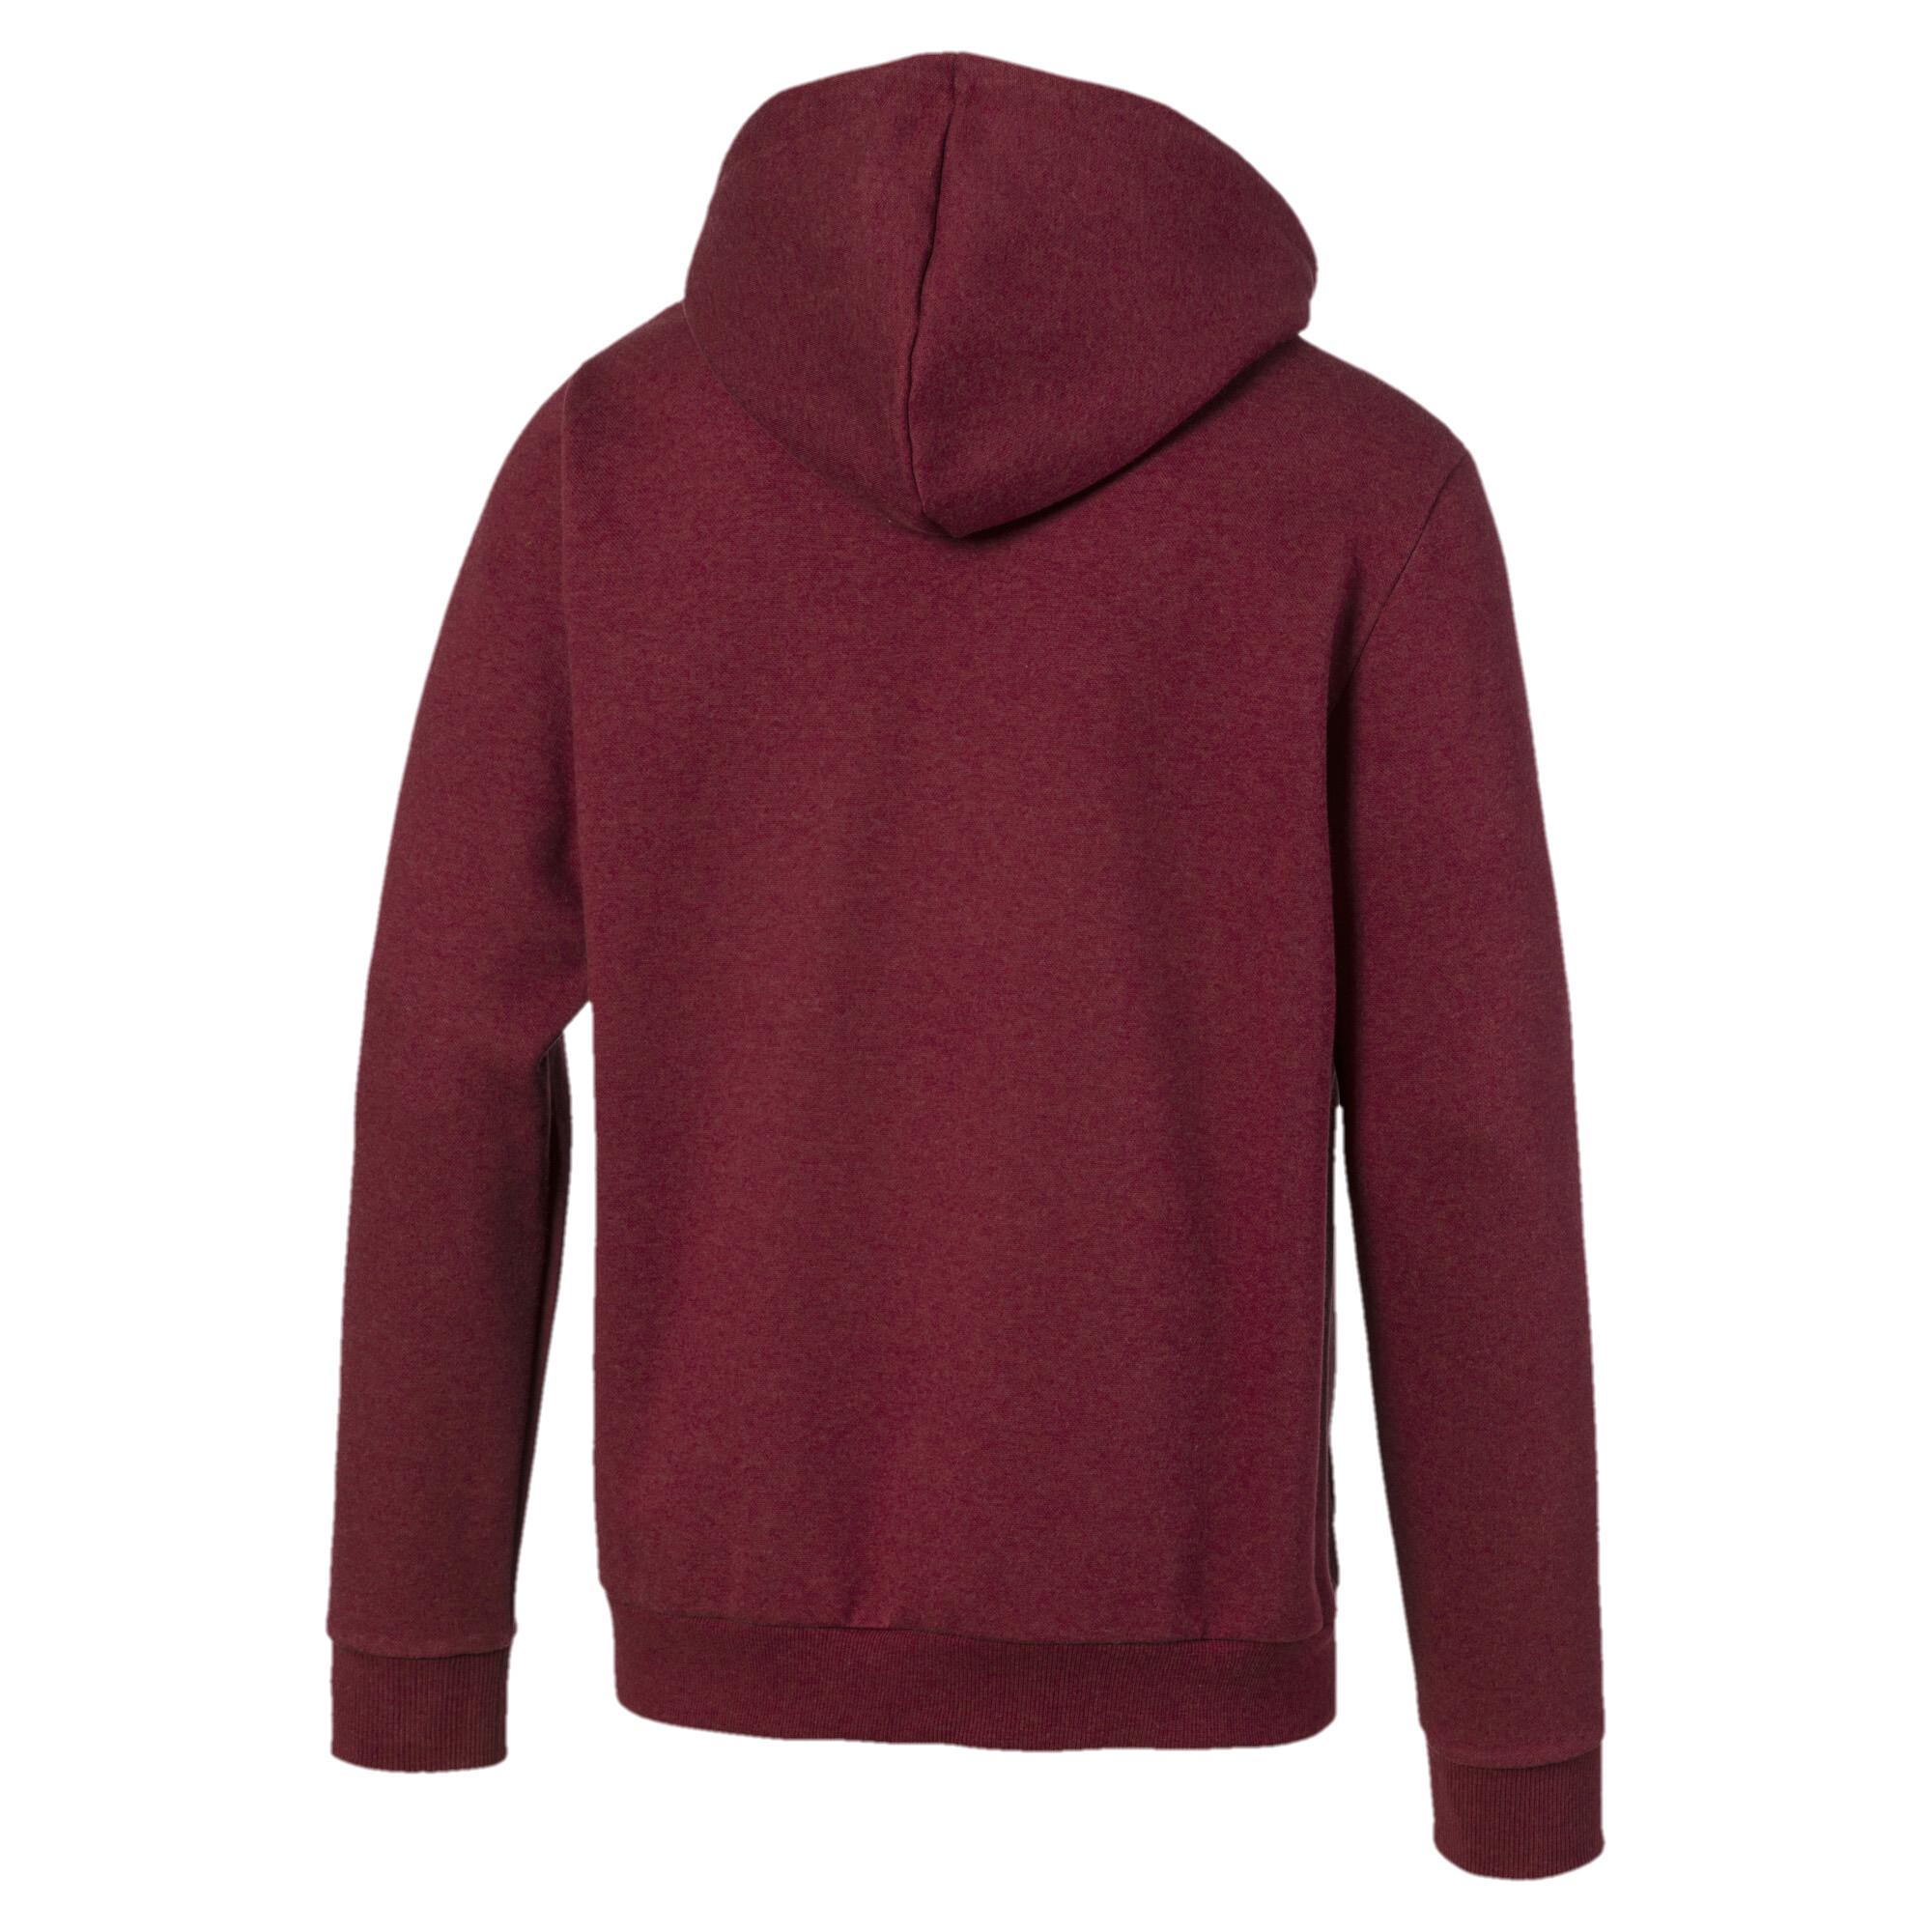 PUMA-Essentials-Men-039-s-Fleece-Hooded-Jacket-Men-Sweat-Basics thumbnail 7